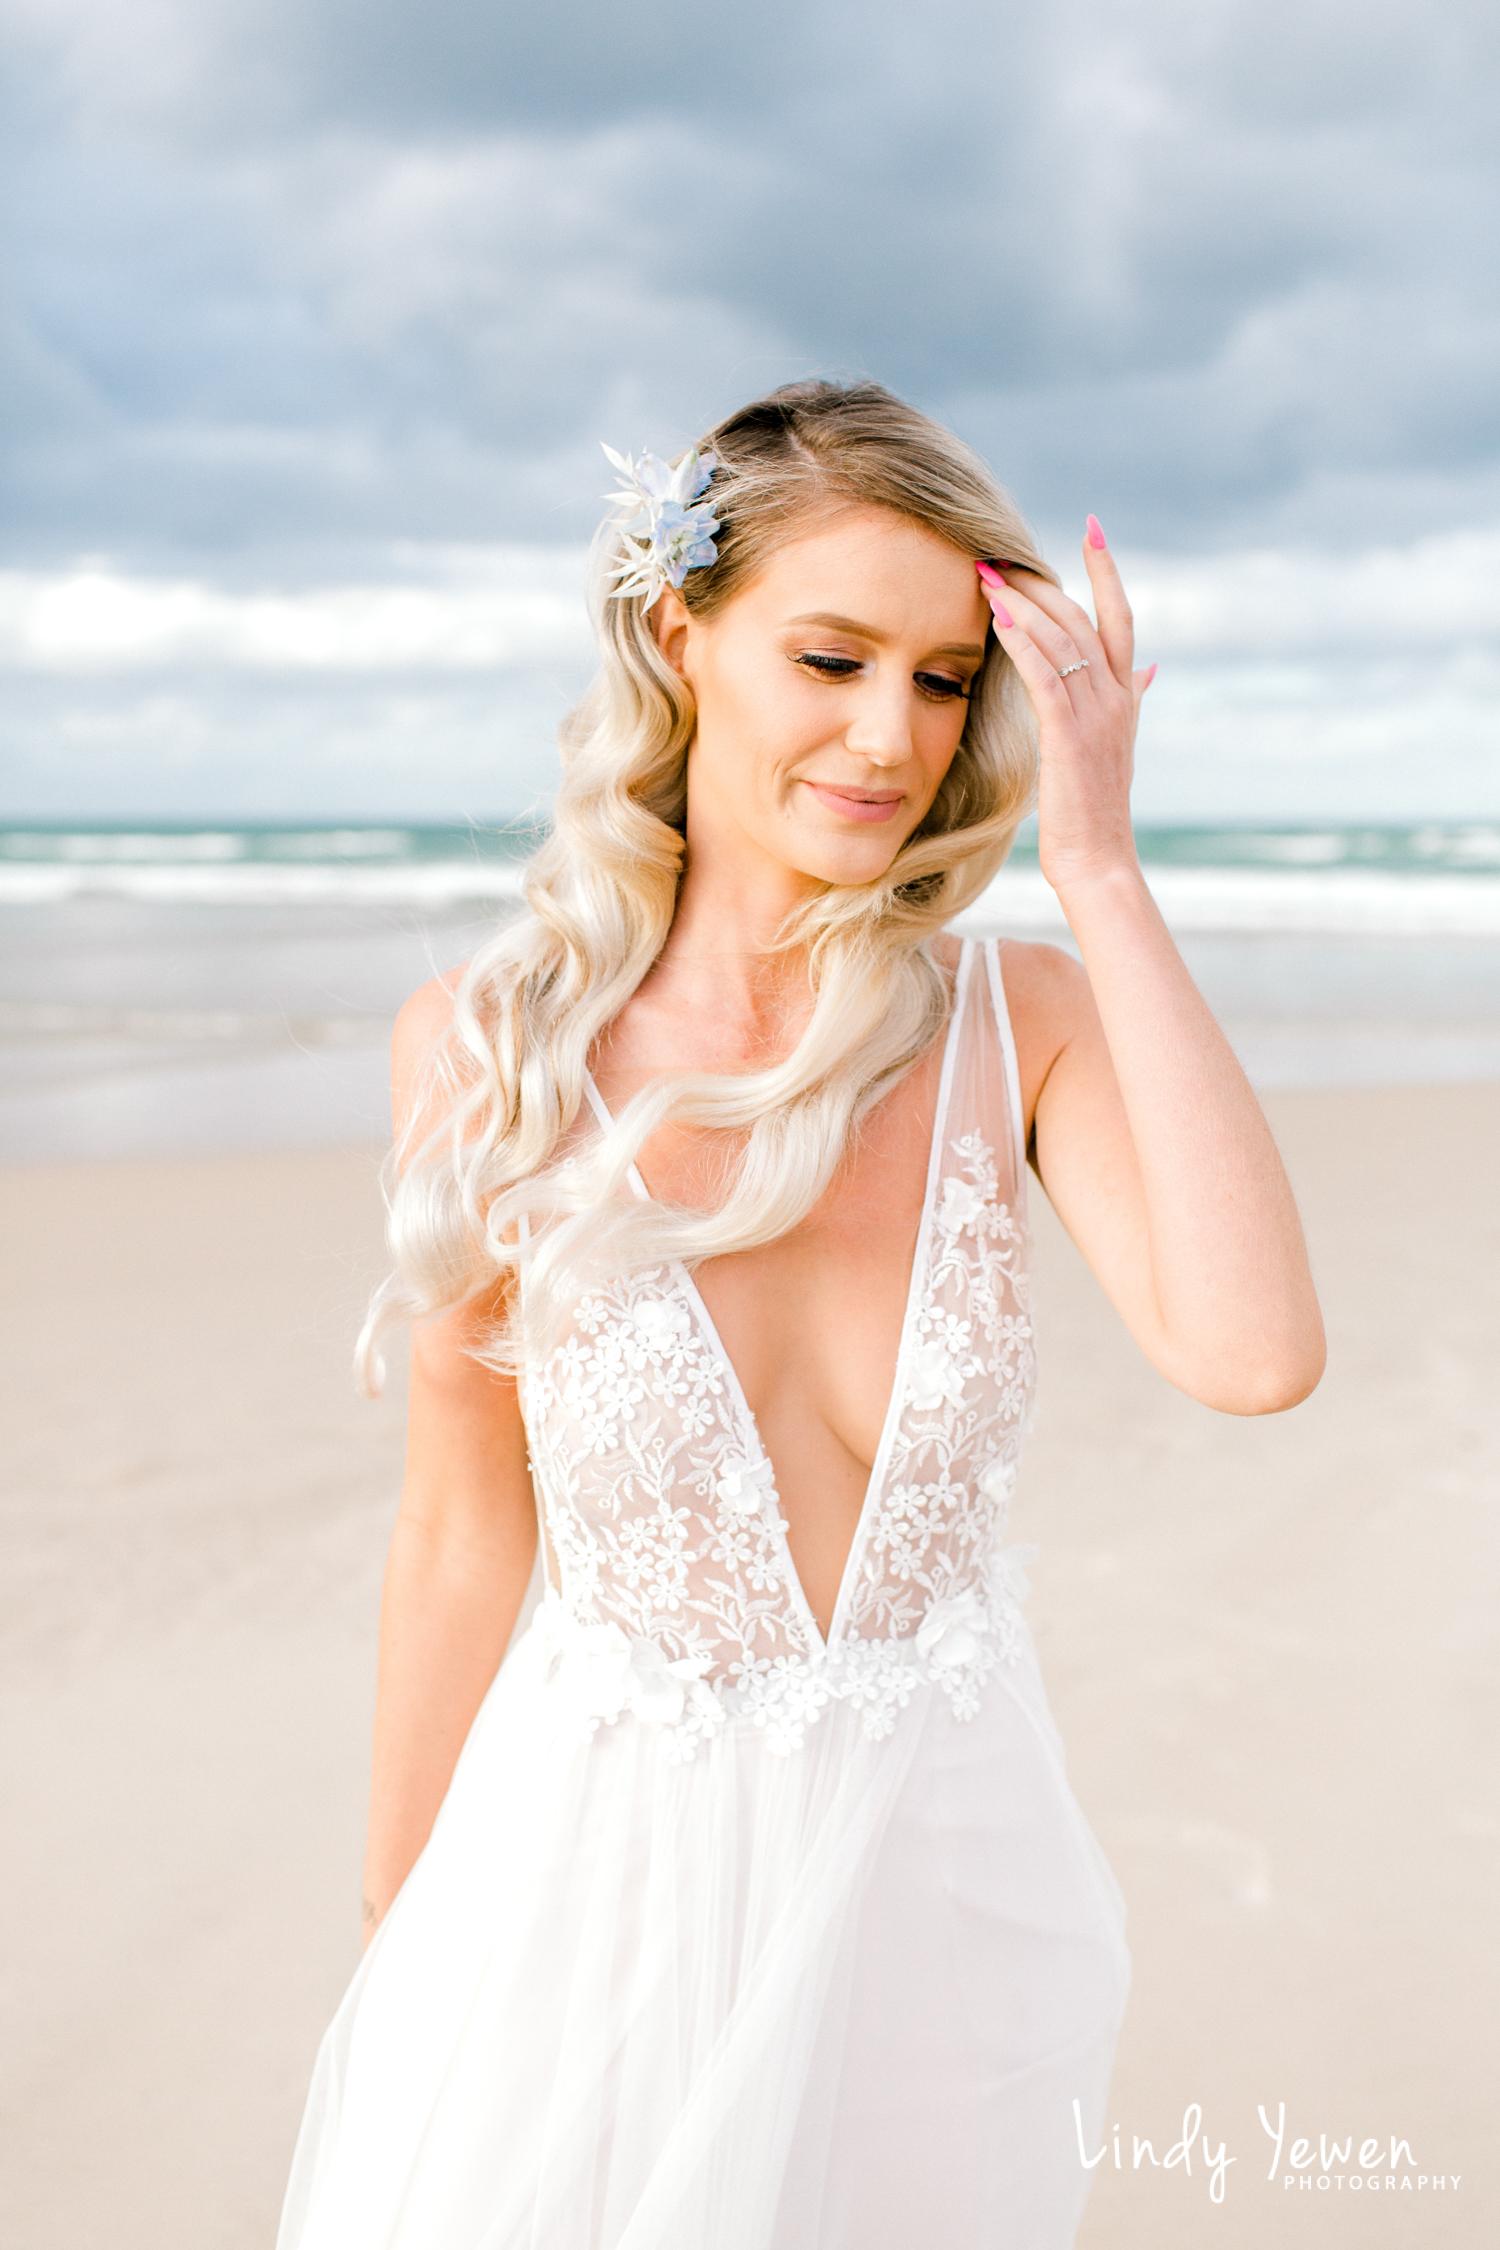 Lindy-Photography-Noosa-Weddings-Grace-Chris 2.jpg